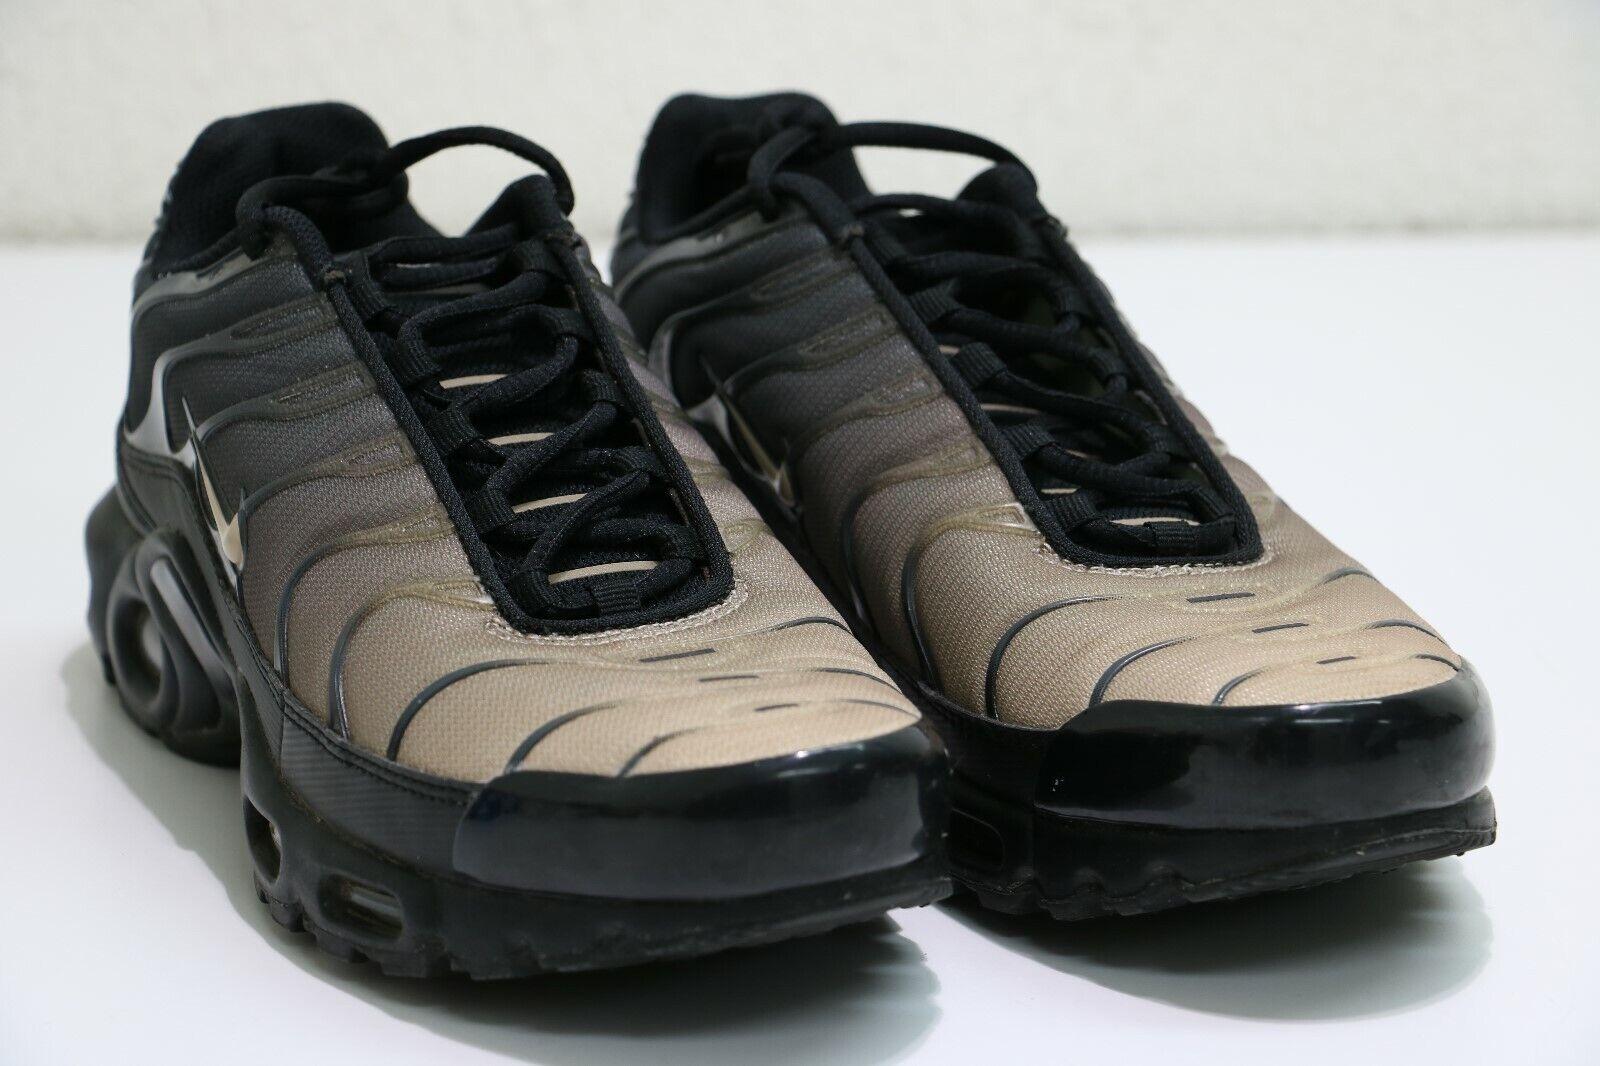 6fb6fc7751 Nike Nike Nike Air Max Plus TN Gradient Mens 852630-026 Black Sand Running  Sneakers